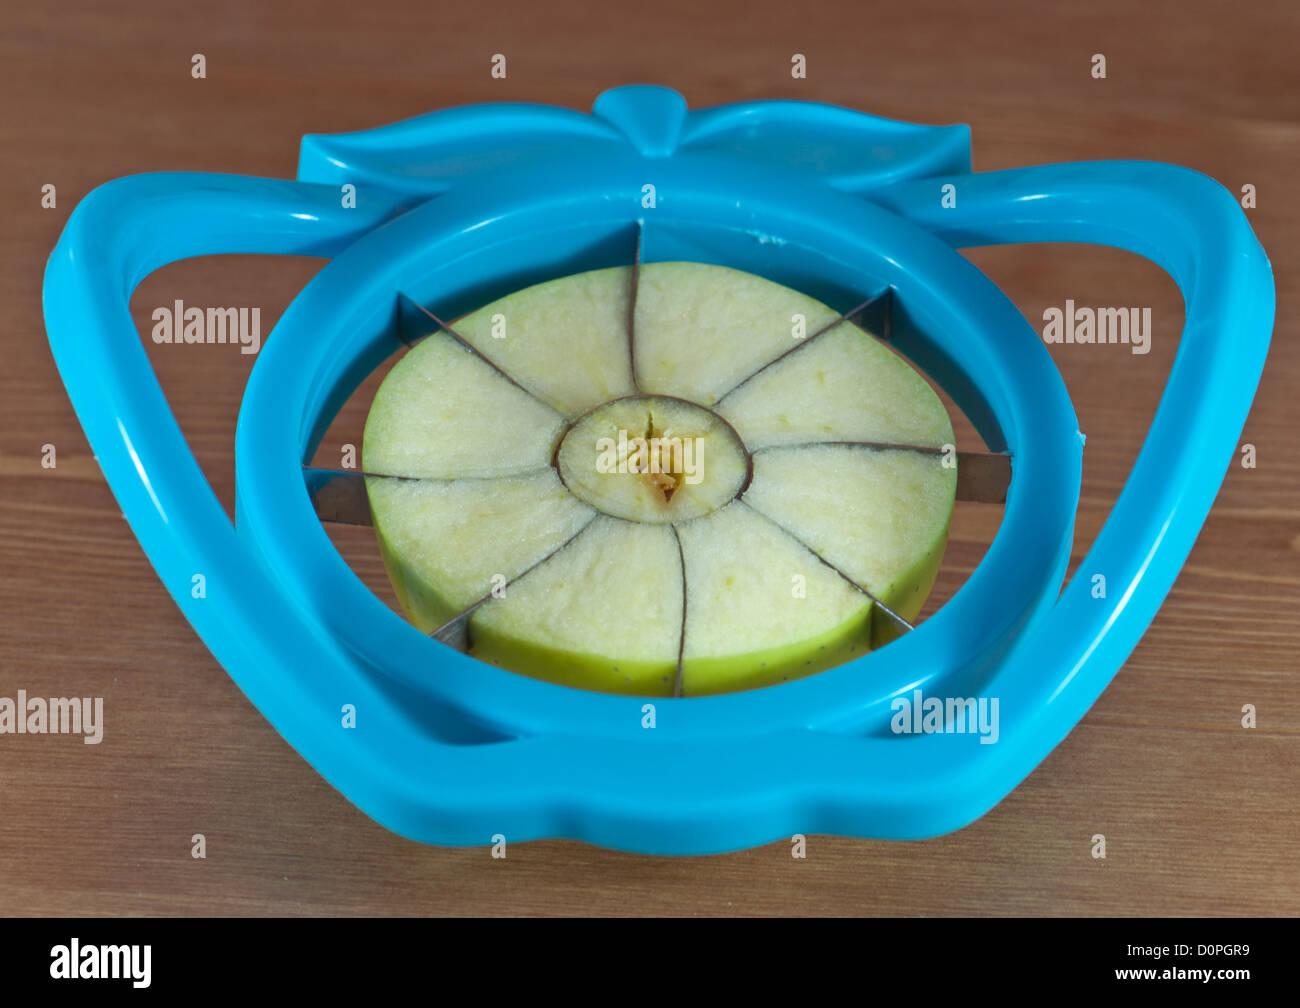 Apple Slicer Stock Photos & Apple Slicer Stock Images - Alamy